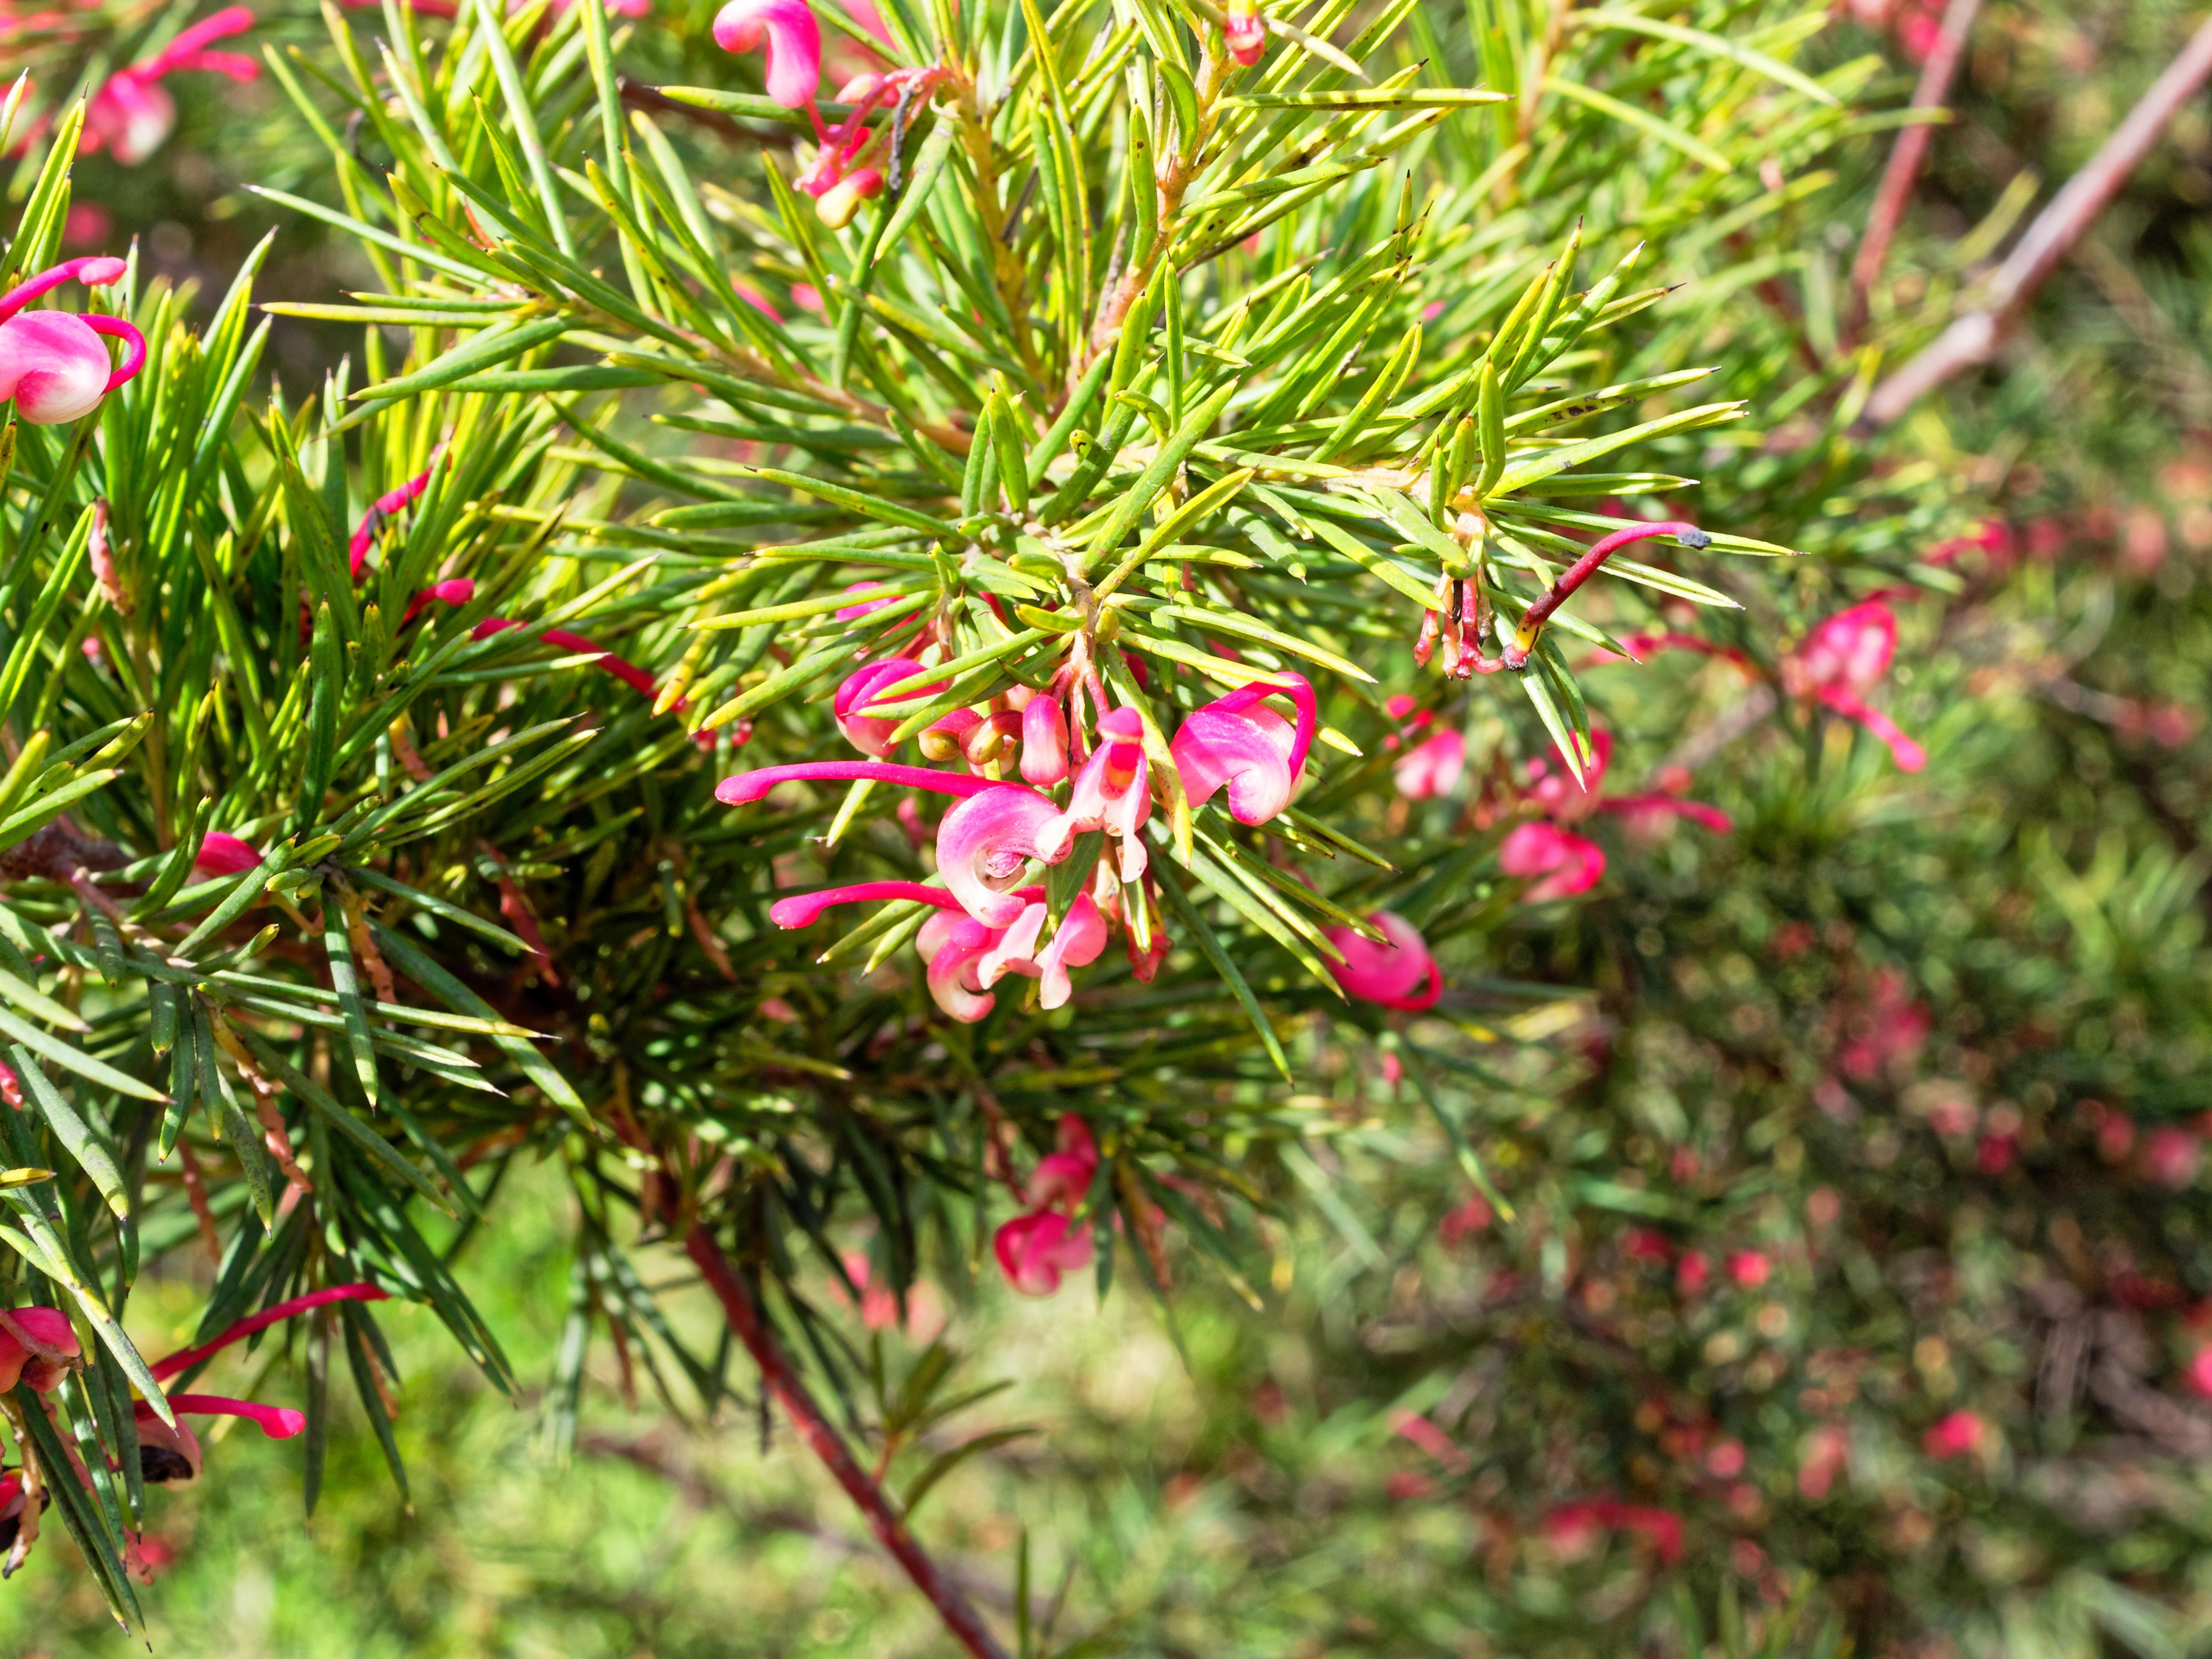 This should be Grevillea-rosmarinifolia-1.jpeg.  Is it missing?